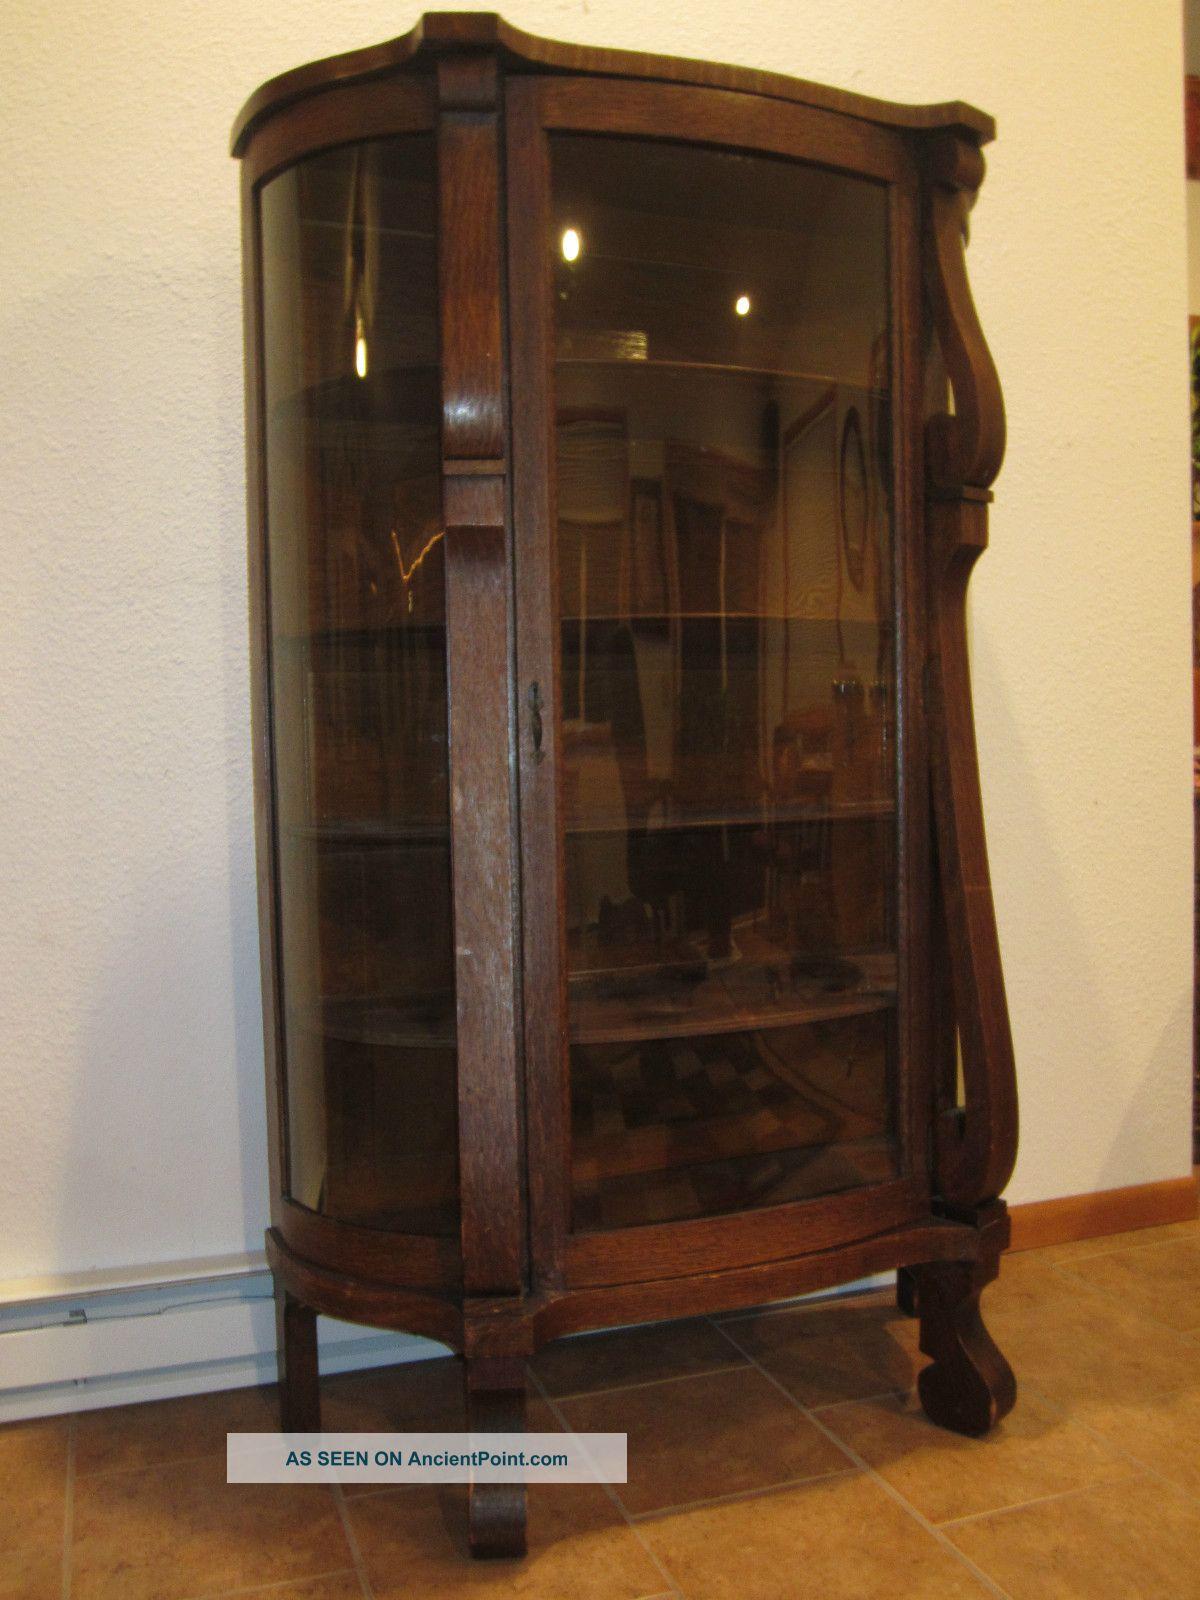 Antique Bowfront Oak China Curio Cabinet Glassware - Ebert Furniture Co.  Antique Bowfront Oak China - Antique Curio Cabinets Antique Furniture